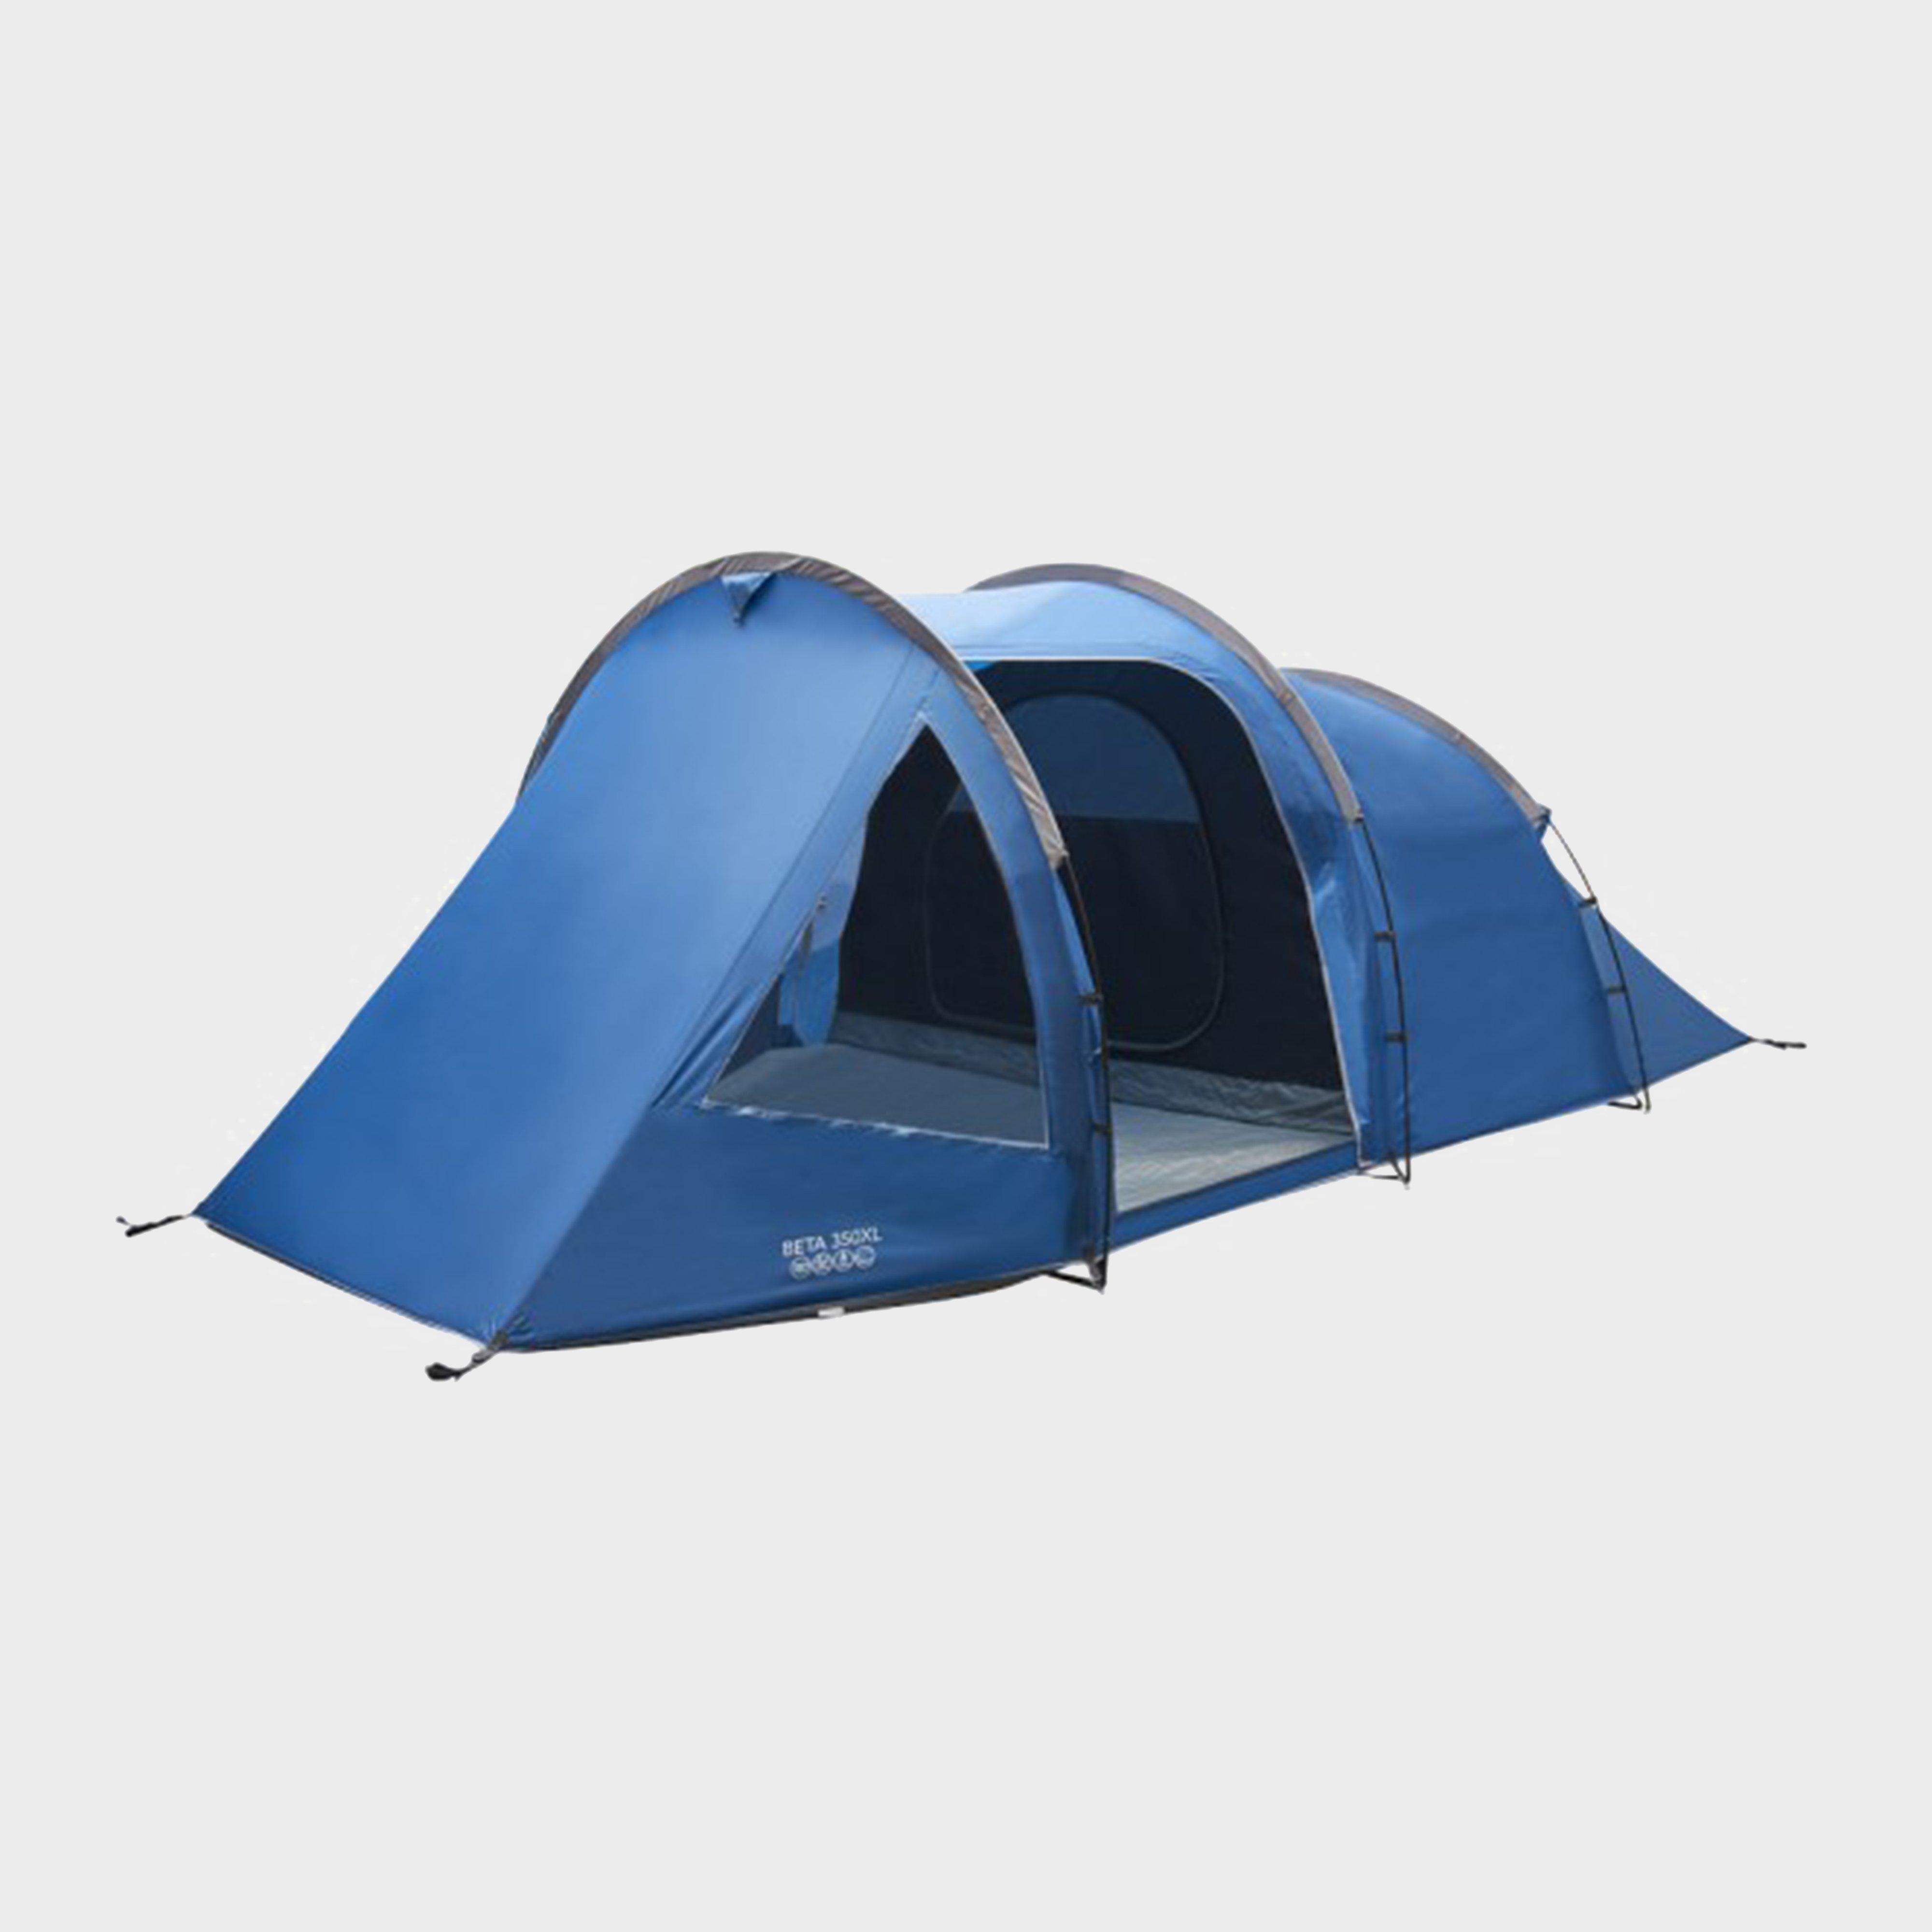 Vango Beta 350Xl Three Person Tent - Blue/Blu, Blue